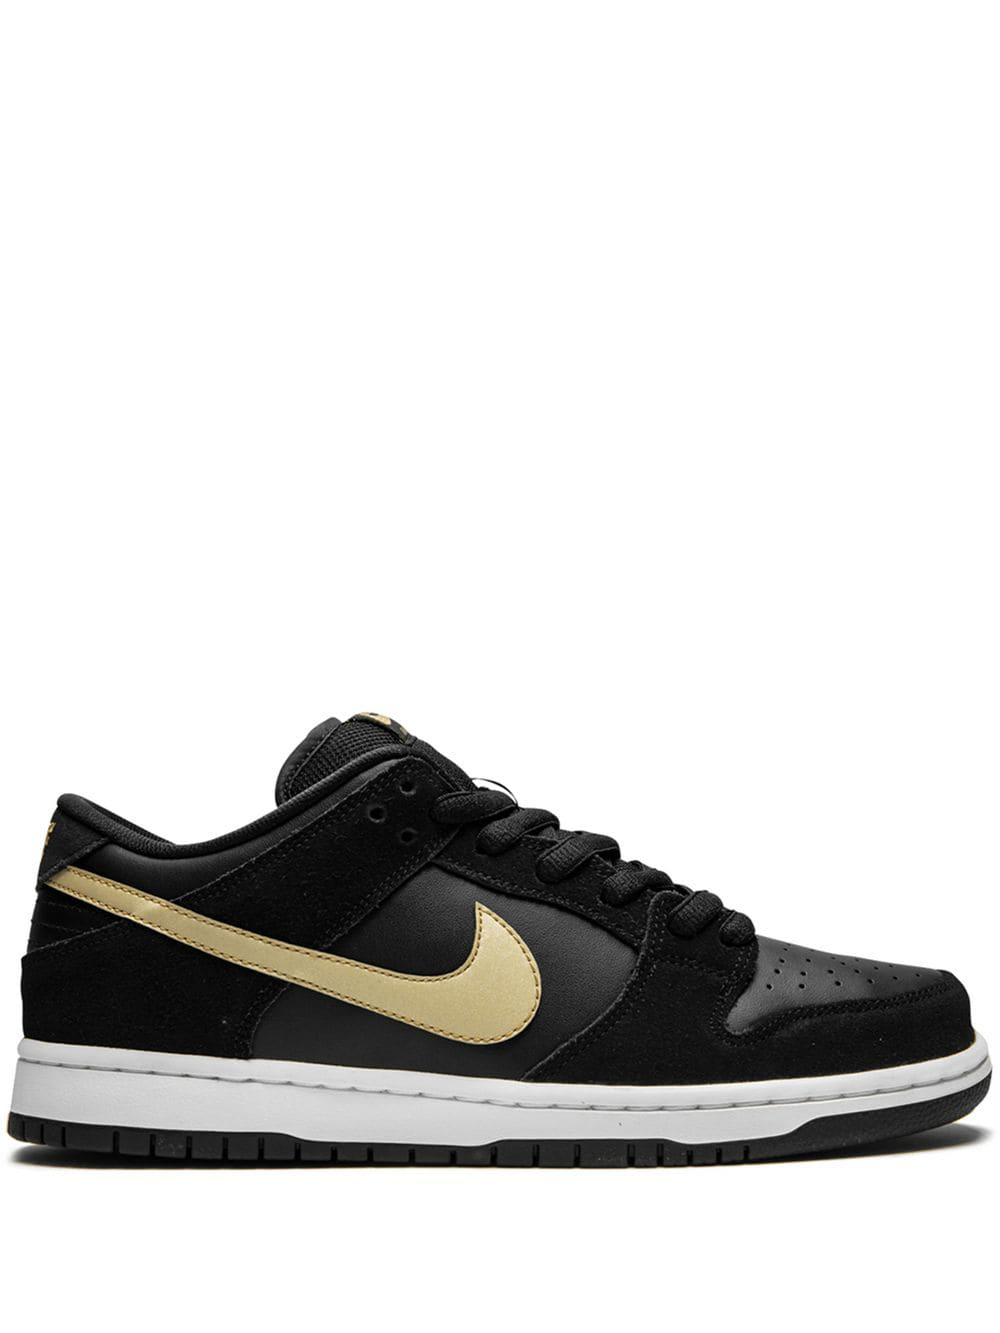 0ccd9302052ec5 Nike Sb Dunk Low Pro Sneakers - Black